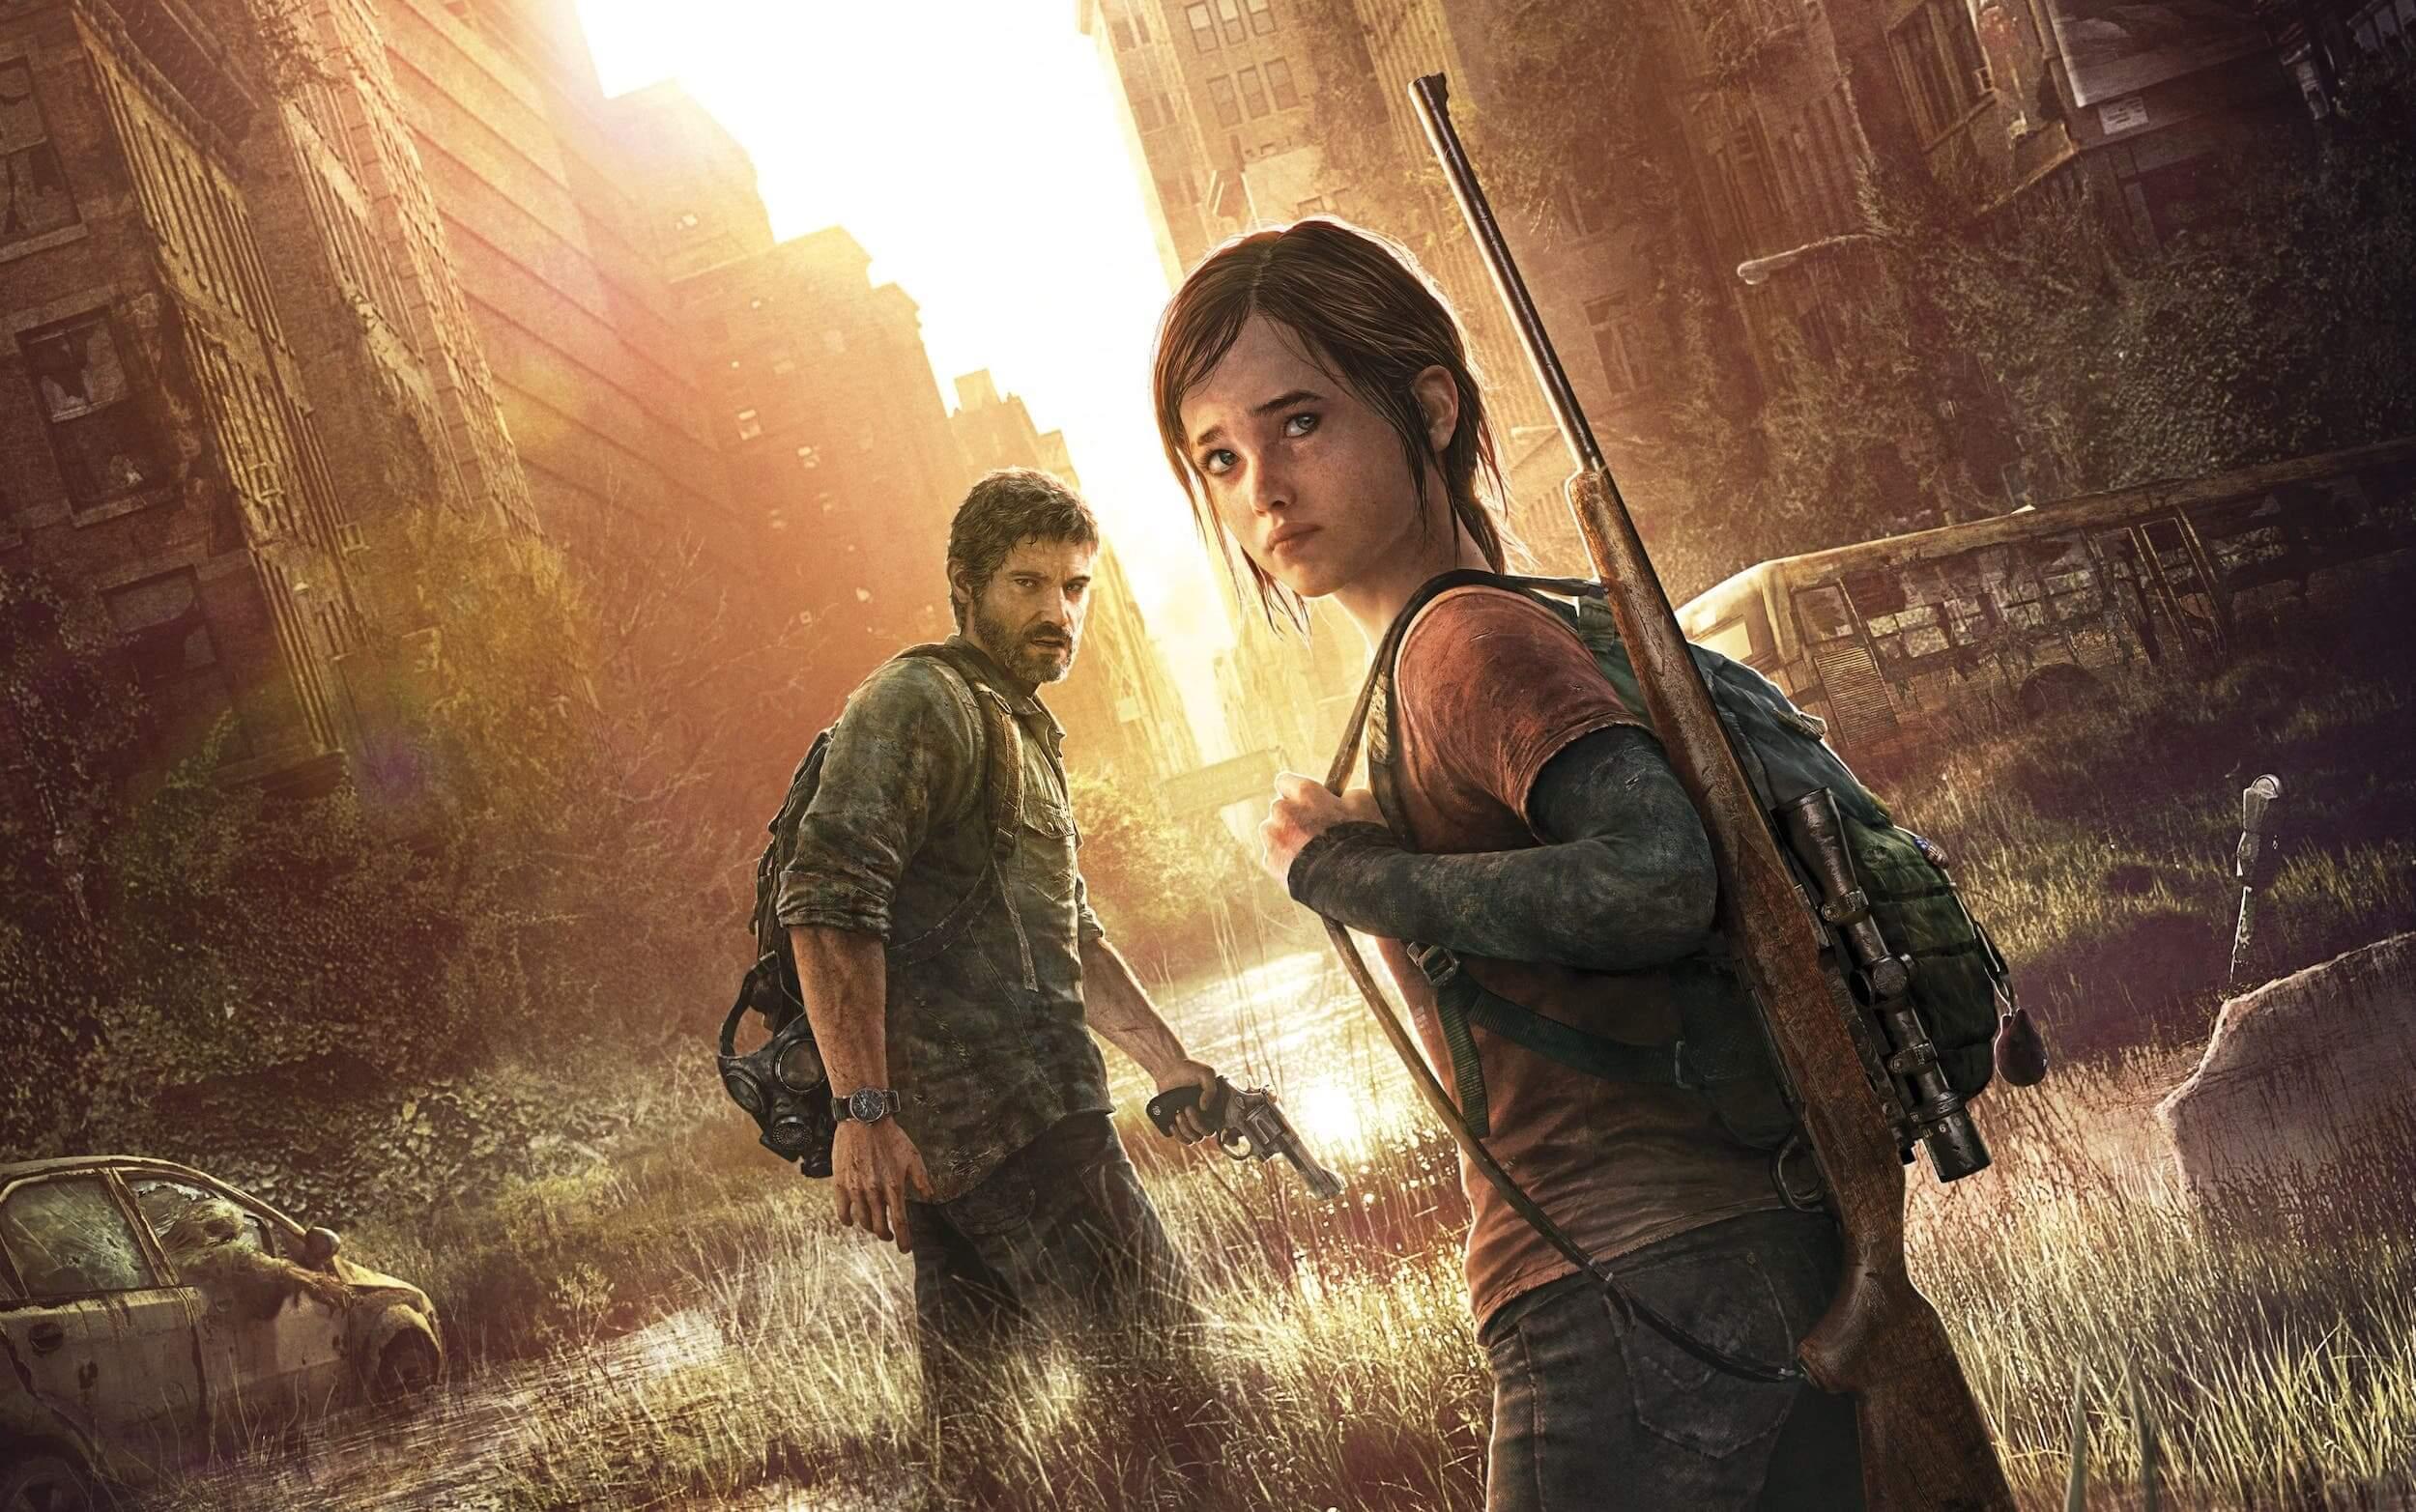 ¿The Last of Us en 2D? Un artista recrea una escena en estilo pixel art